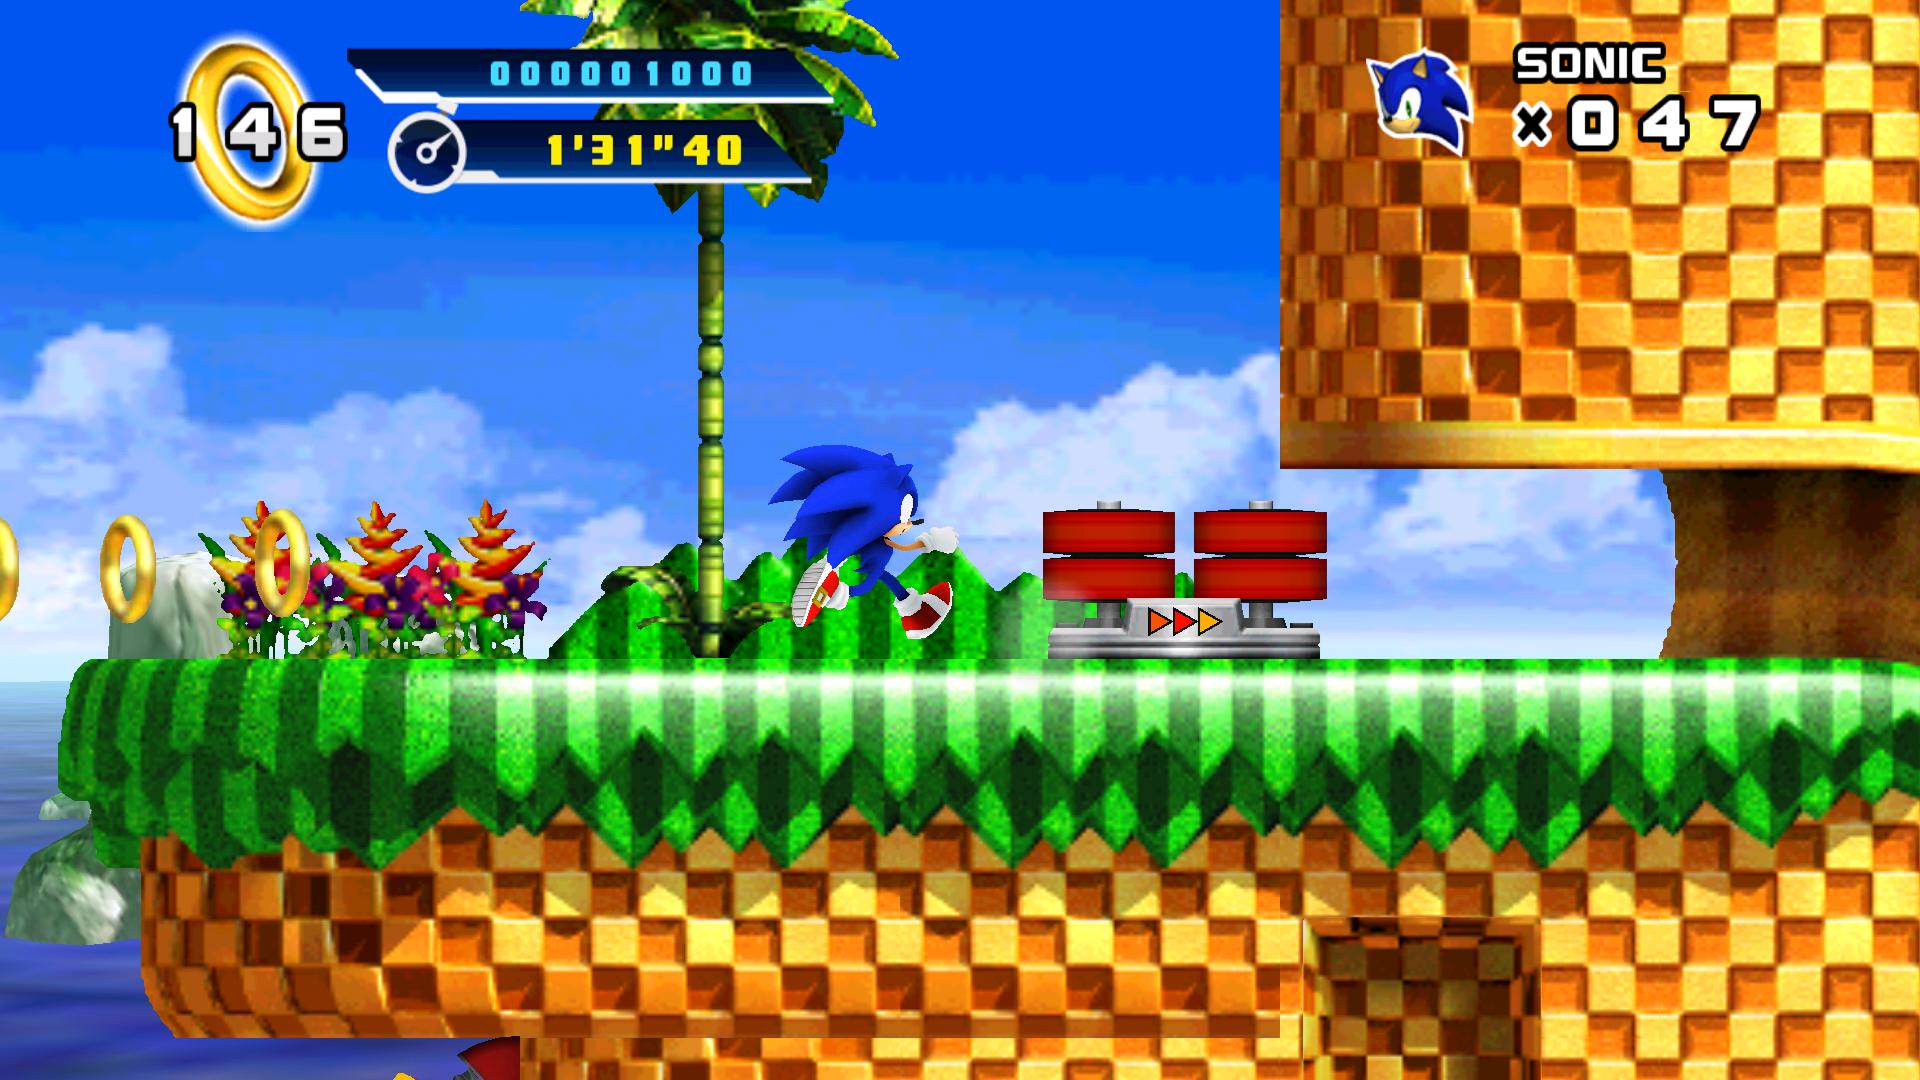 Sonic 4™ Episode I screenshot #12